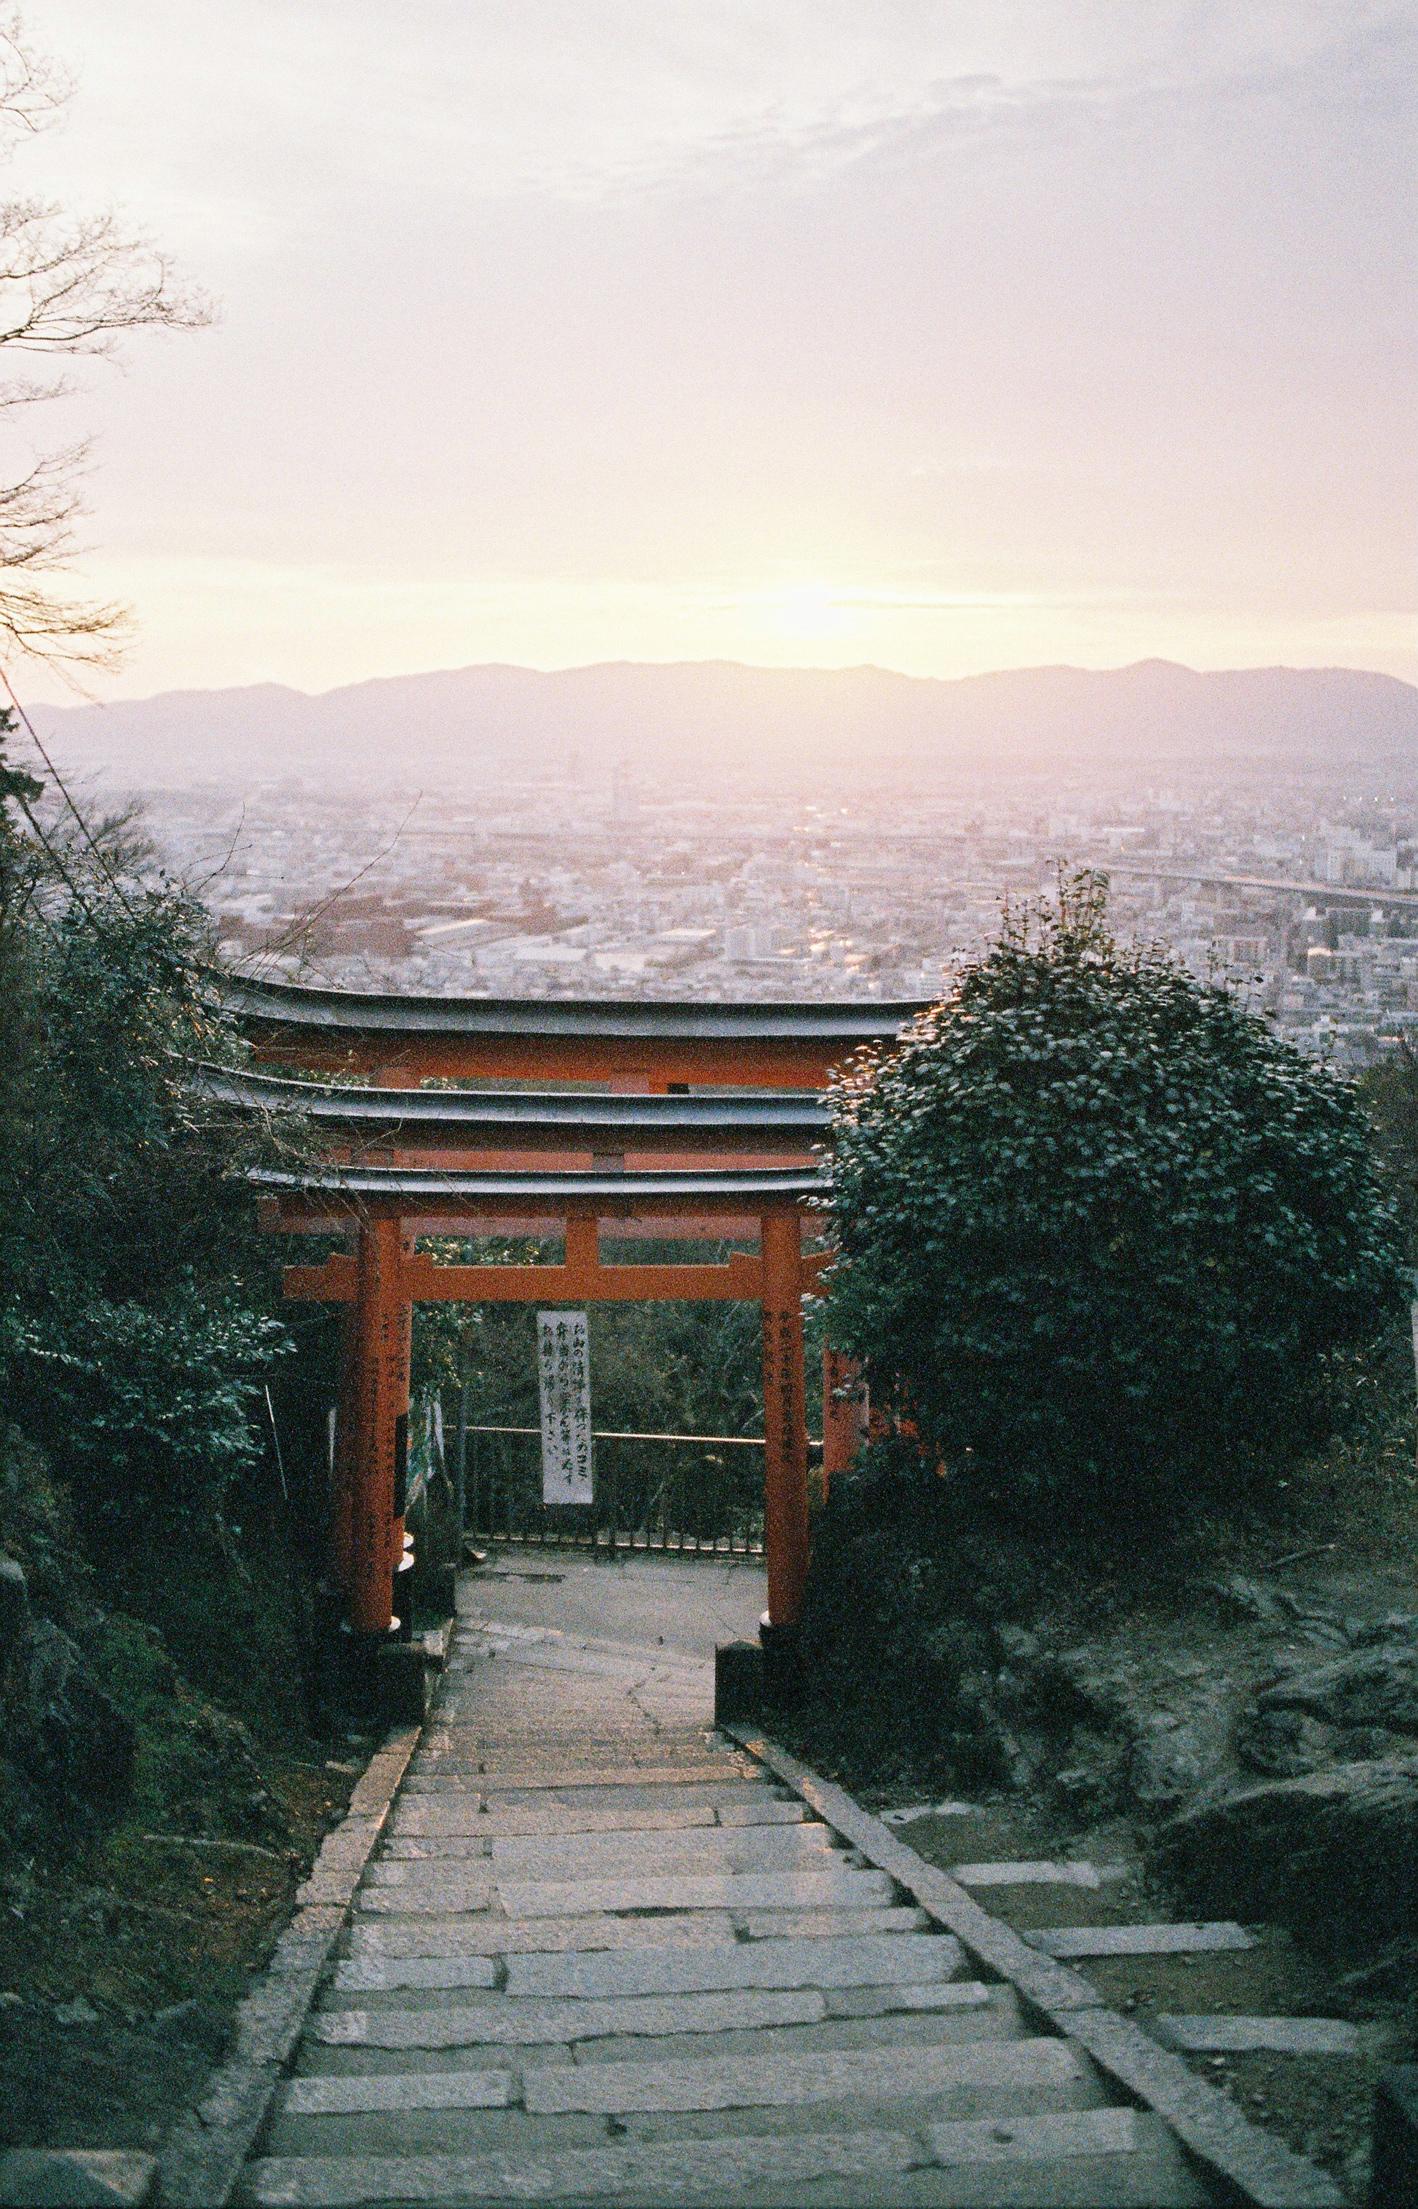 023-kyoto-arashiyama-sophie-baker-photography